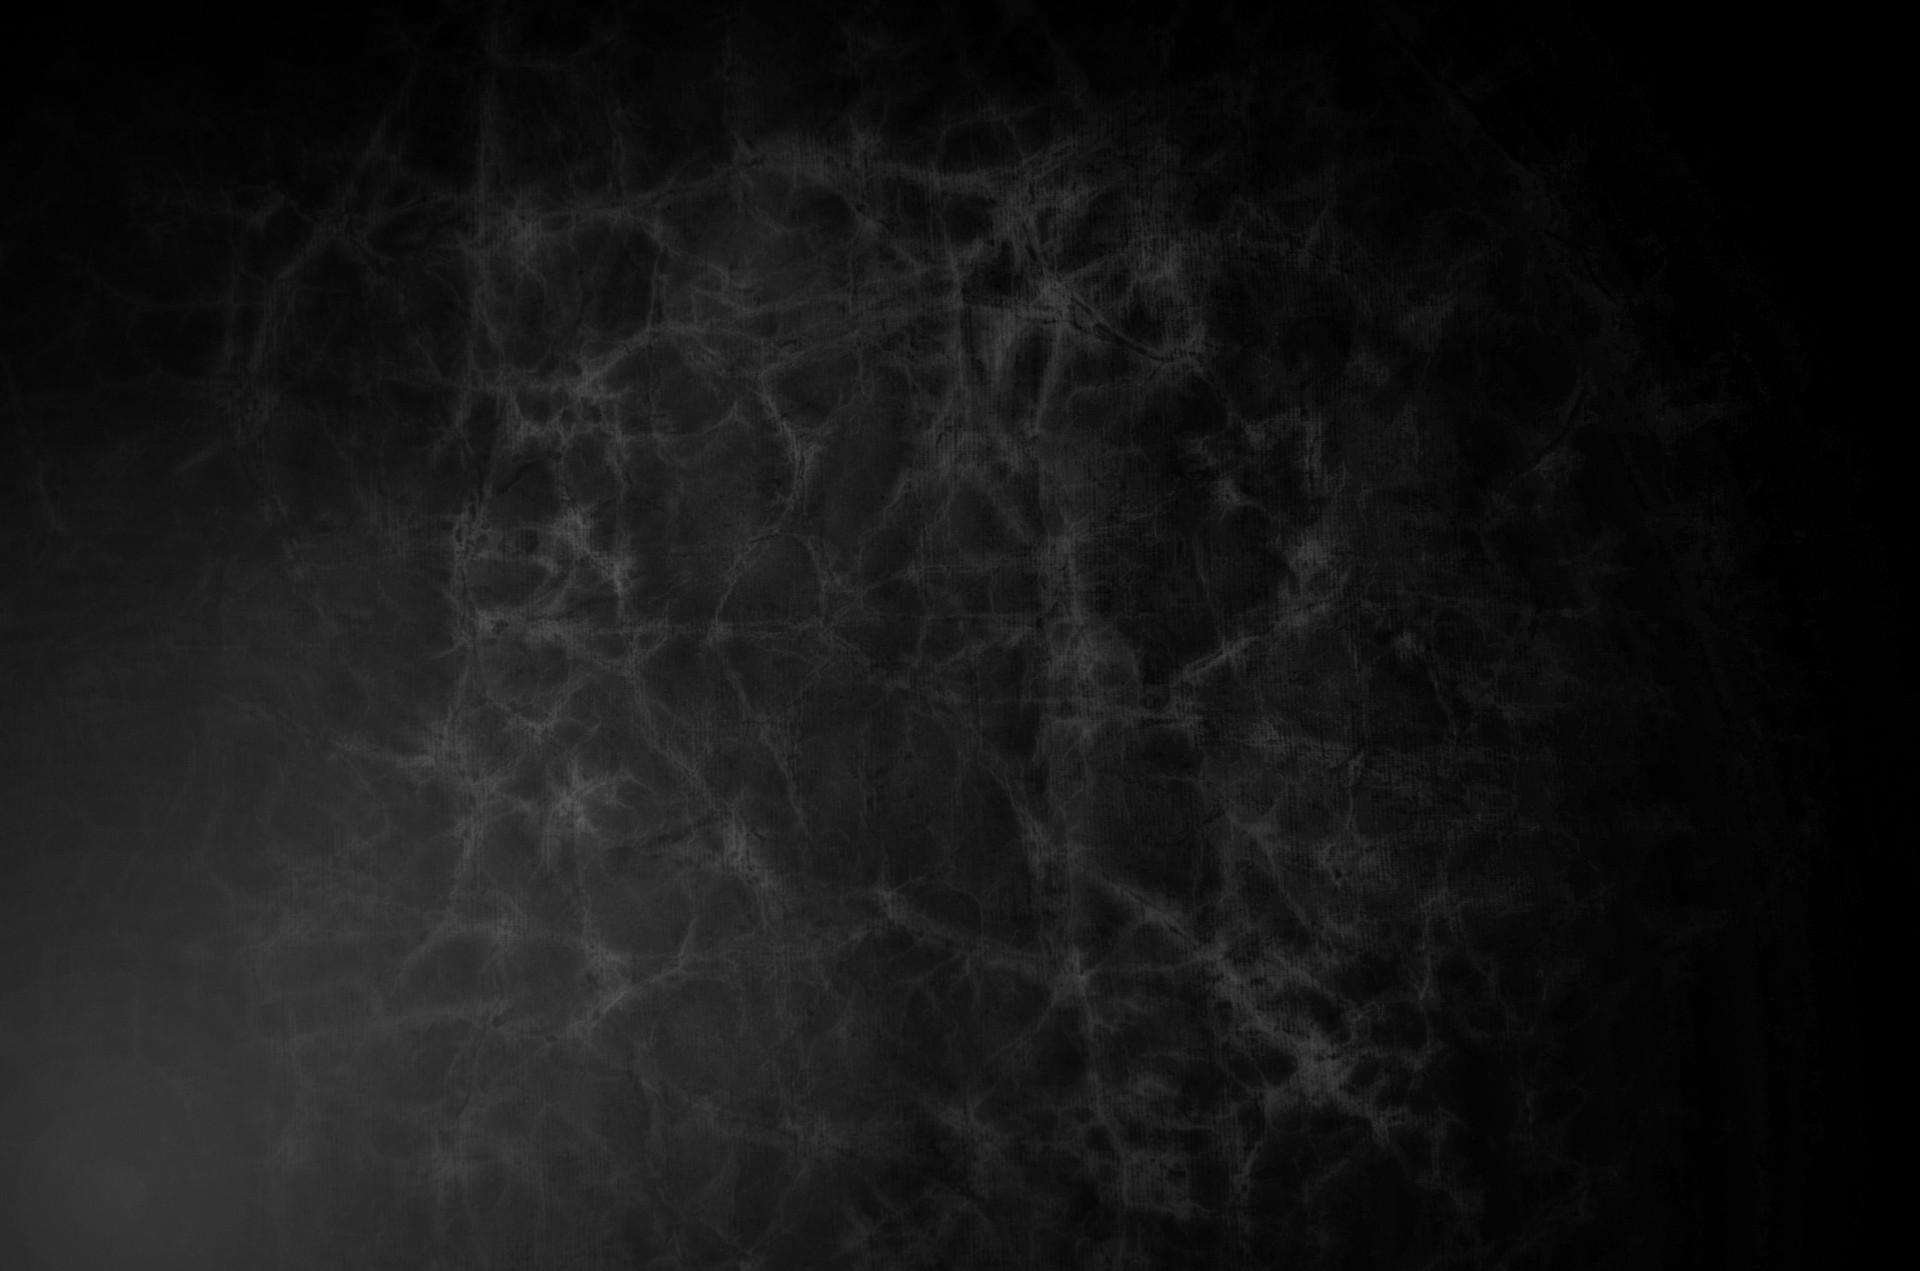 Black Light Wallpaper Background Free Stock Photo Public Domain Pictures